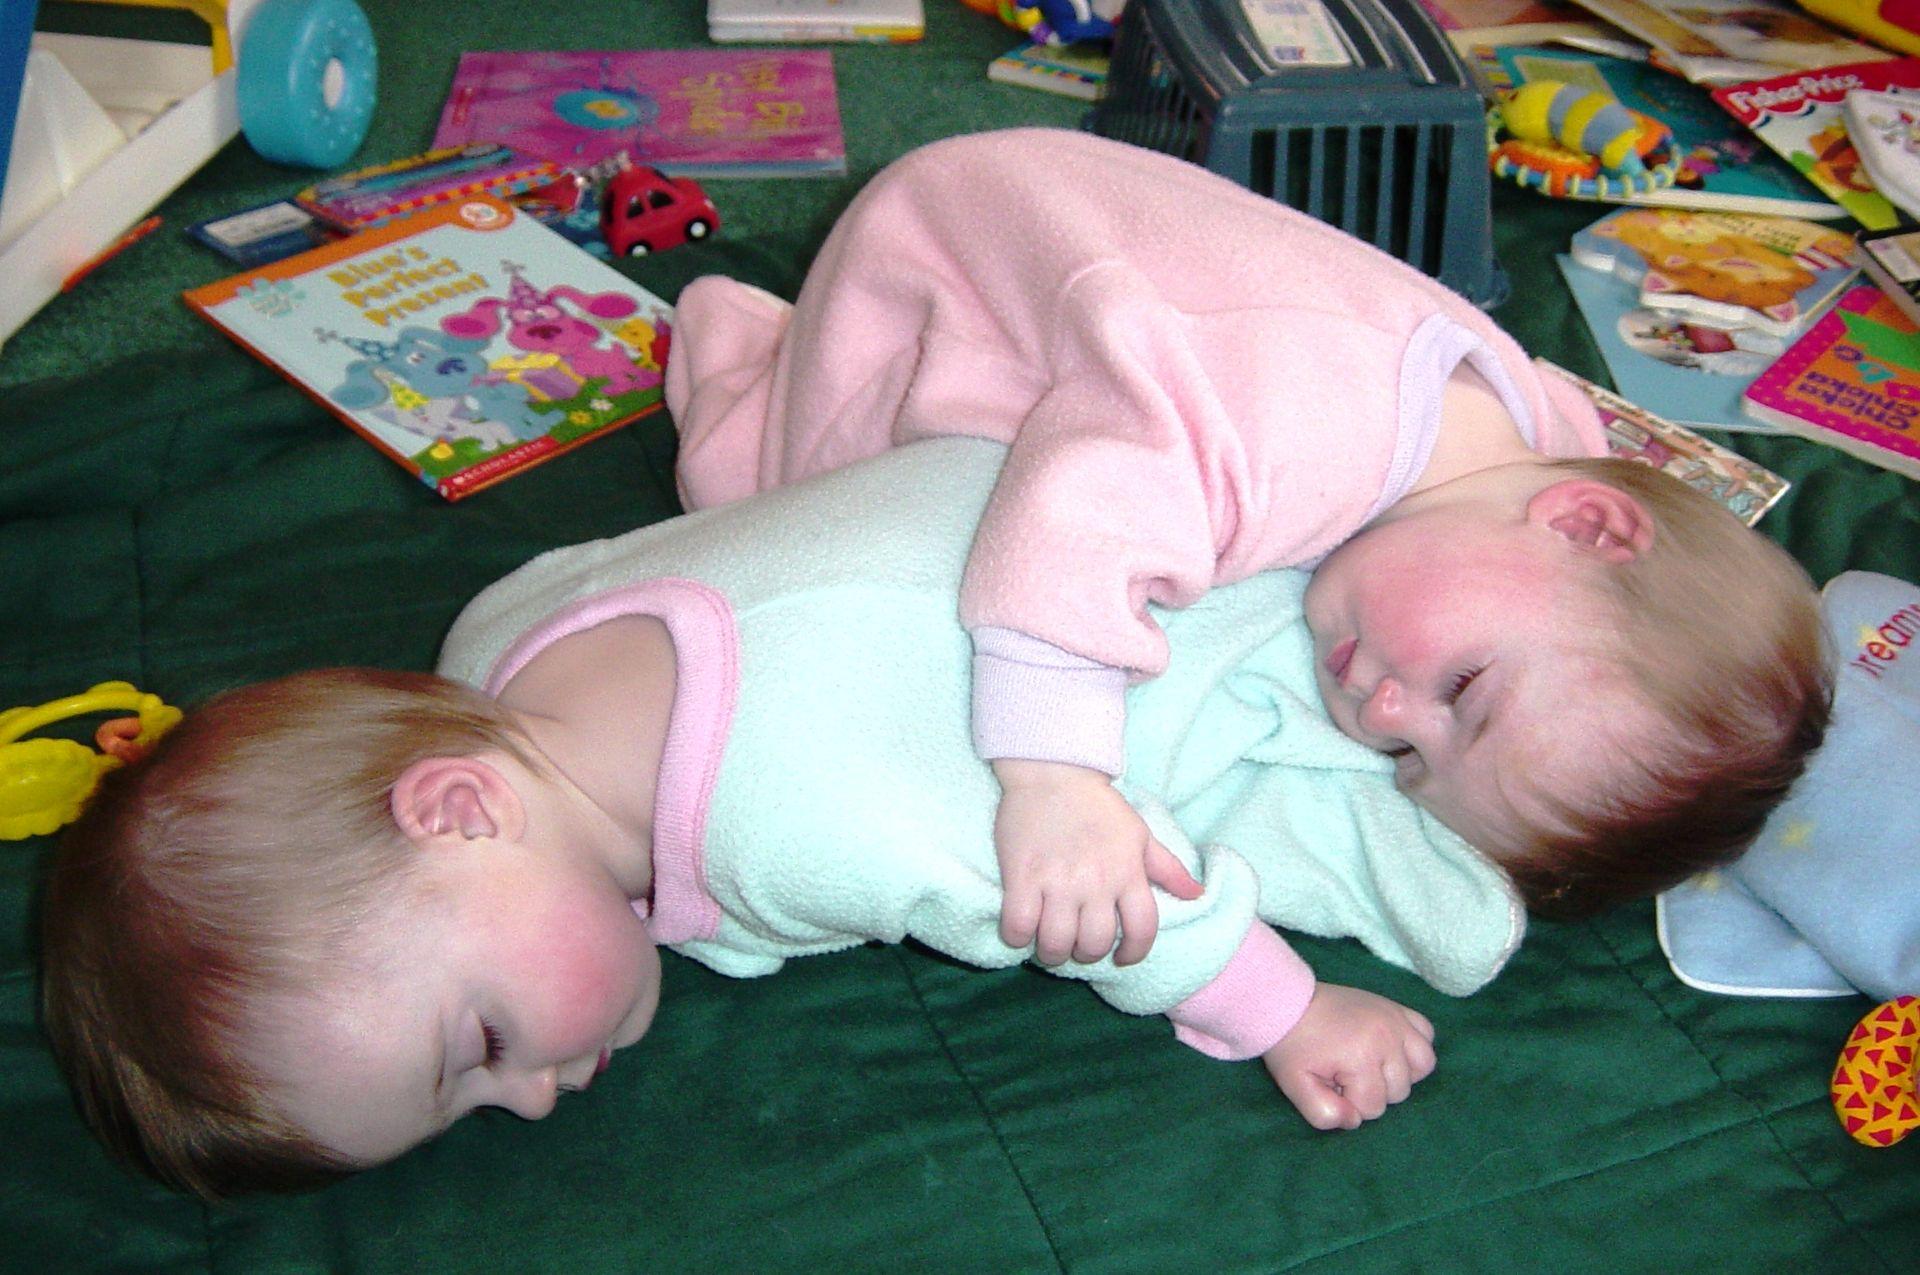 Infant Wikipedia